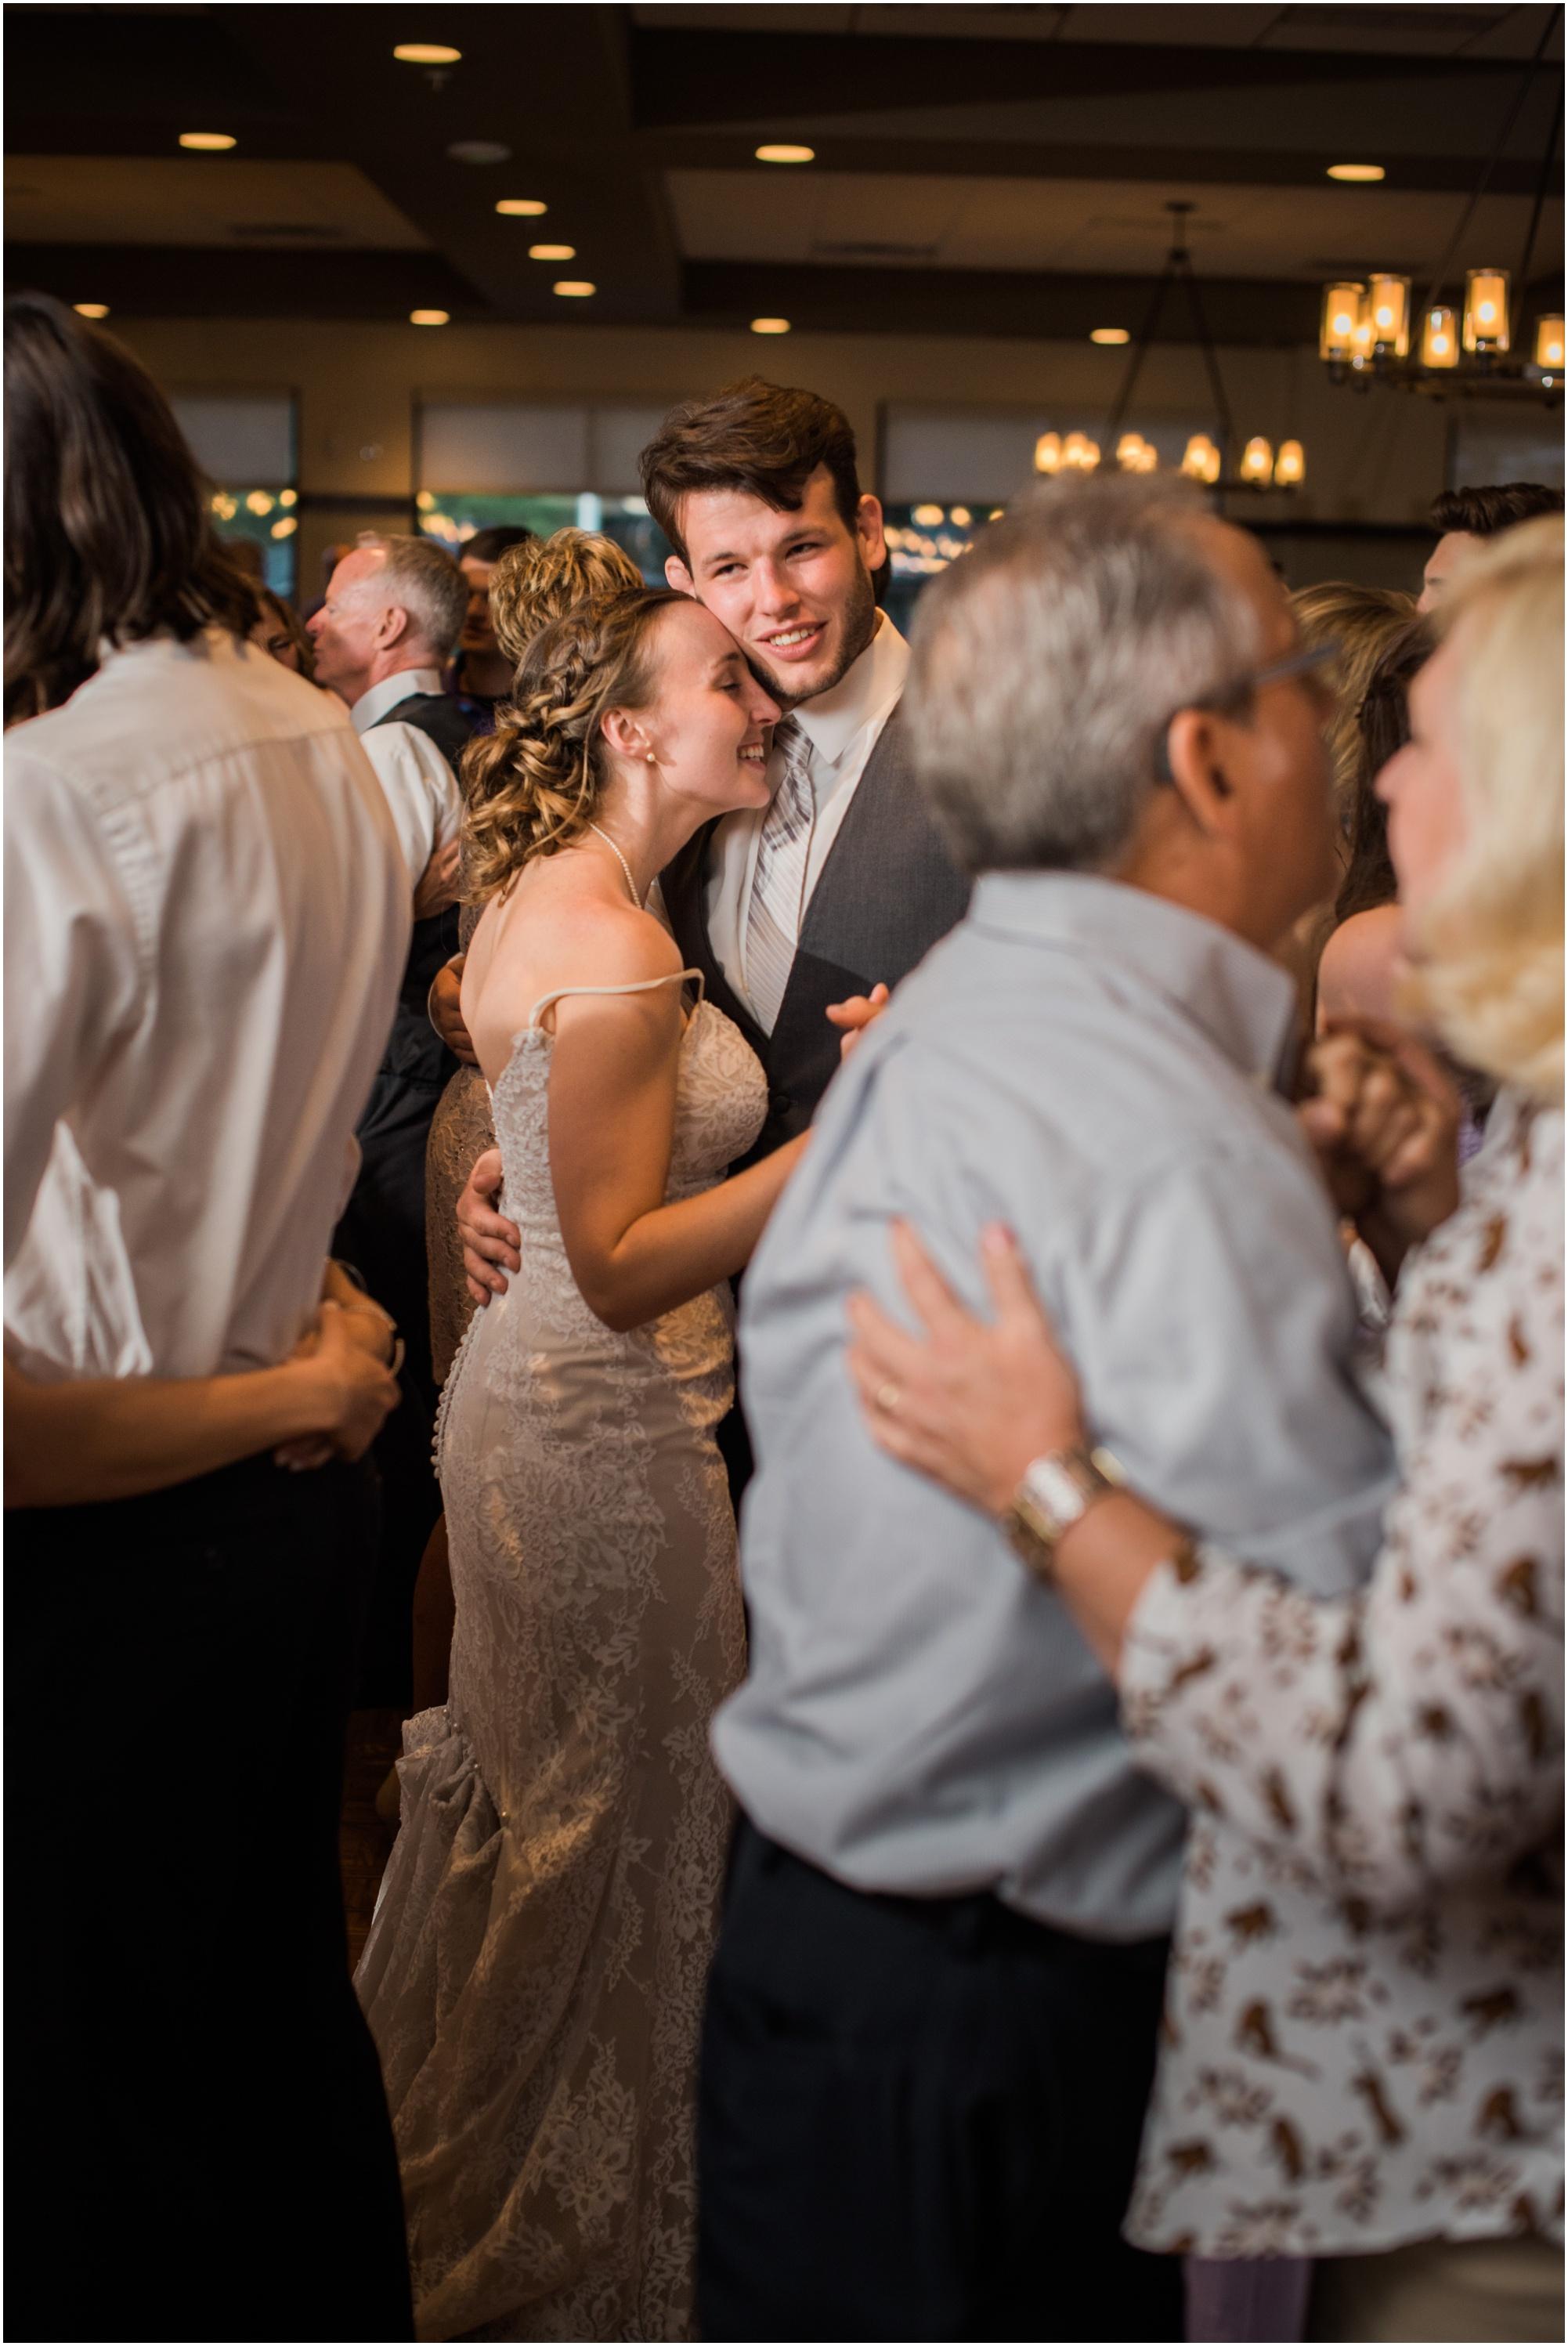 Wisconsin-Wedding-Photographer-Reedsburg-Country-Club-Kaela-and Matt-Wedding-972.jpg